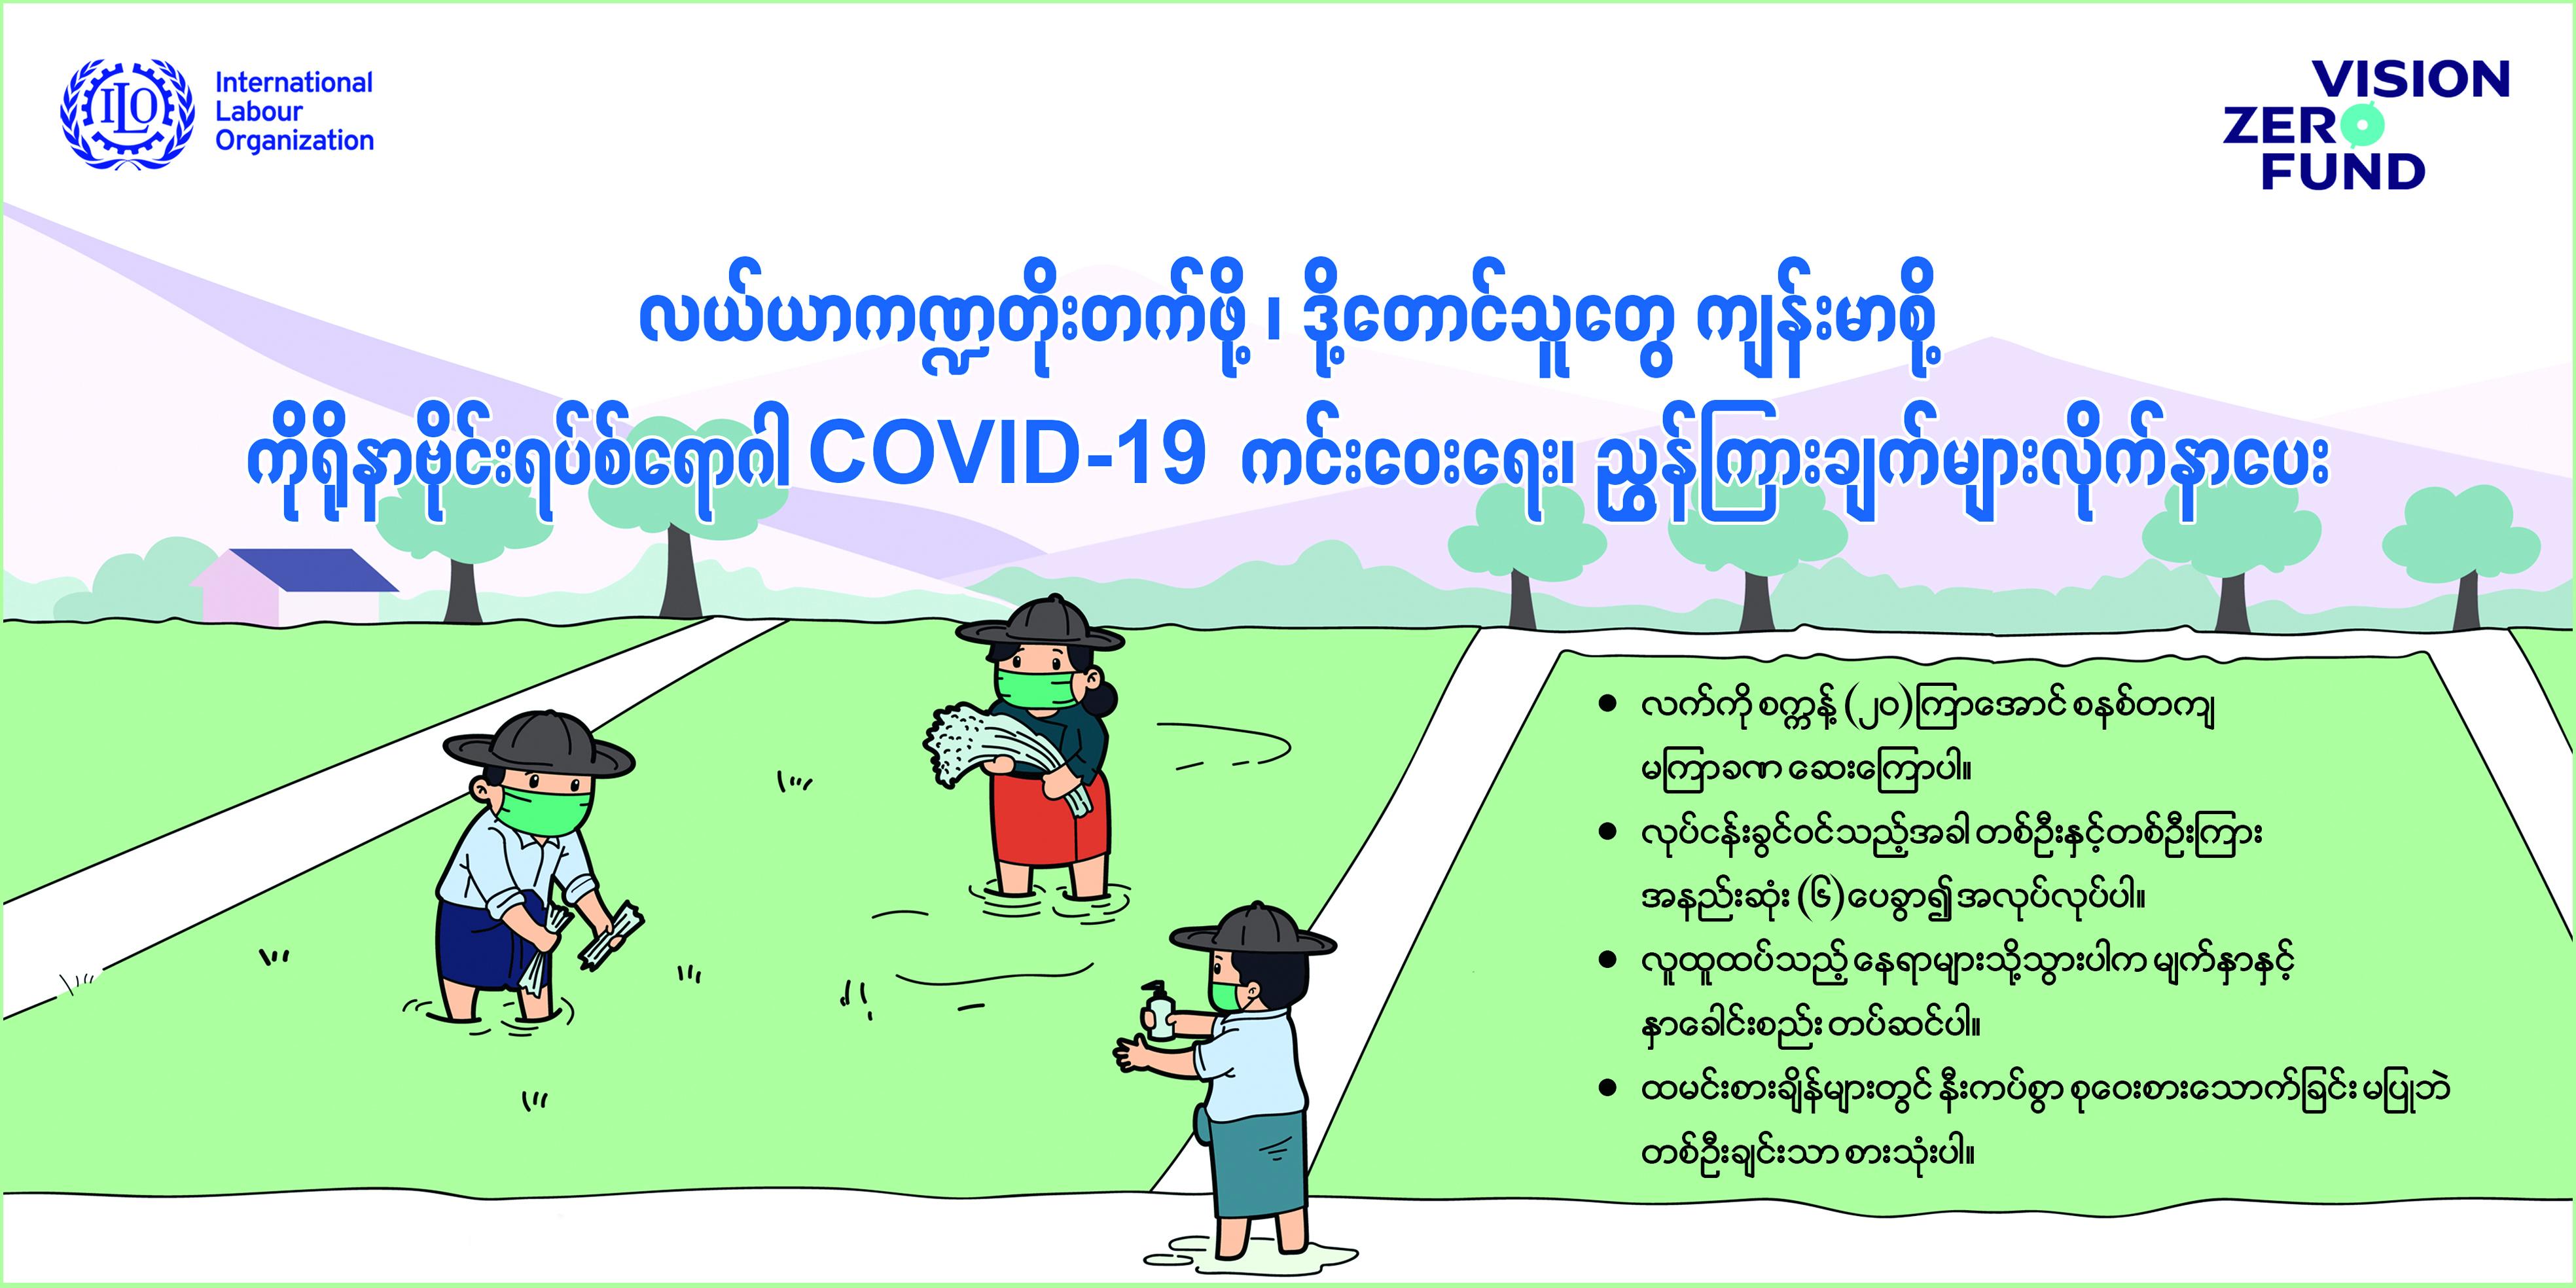 Course Image COVID- 19 ကာကွယ်တားဆီးရေးနှင့် လျှော့ချရေး  သင်တန်း (လယ်ယာစိုက်ပျိုးရေးလုပ်ငန်း)